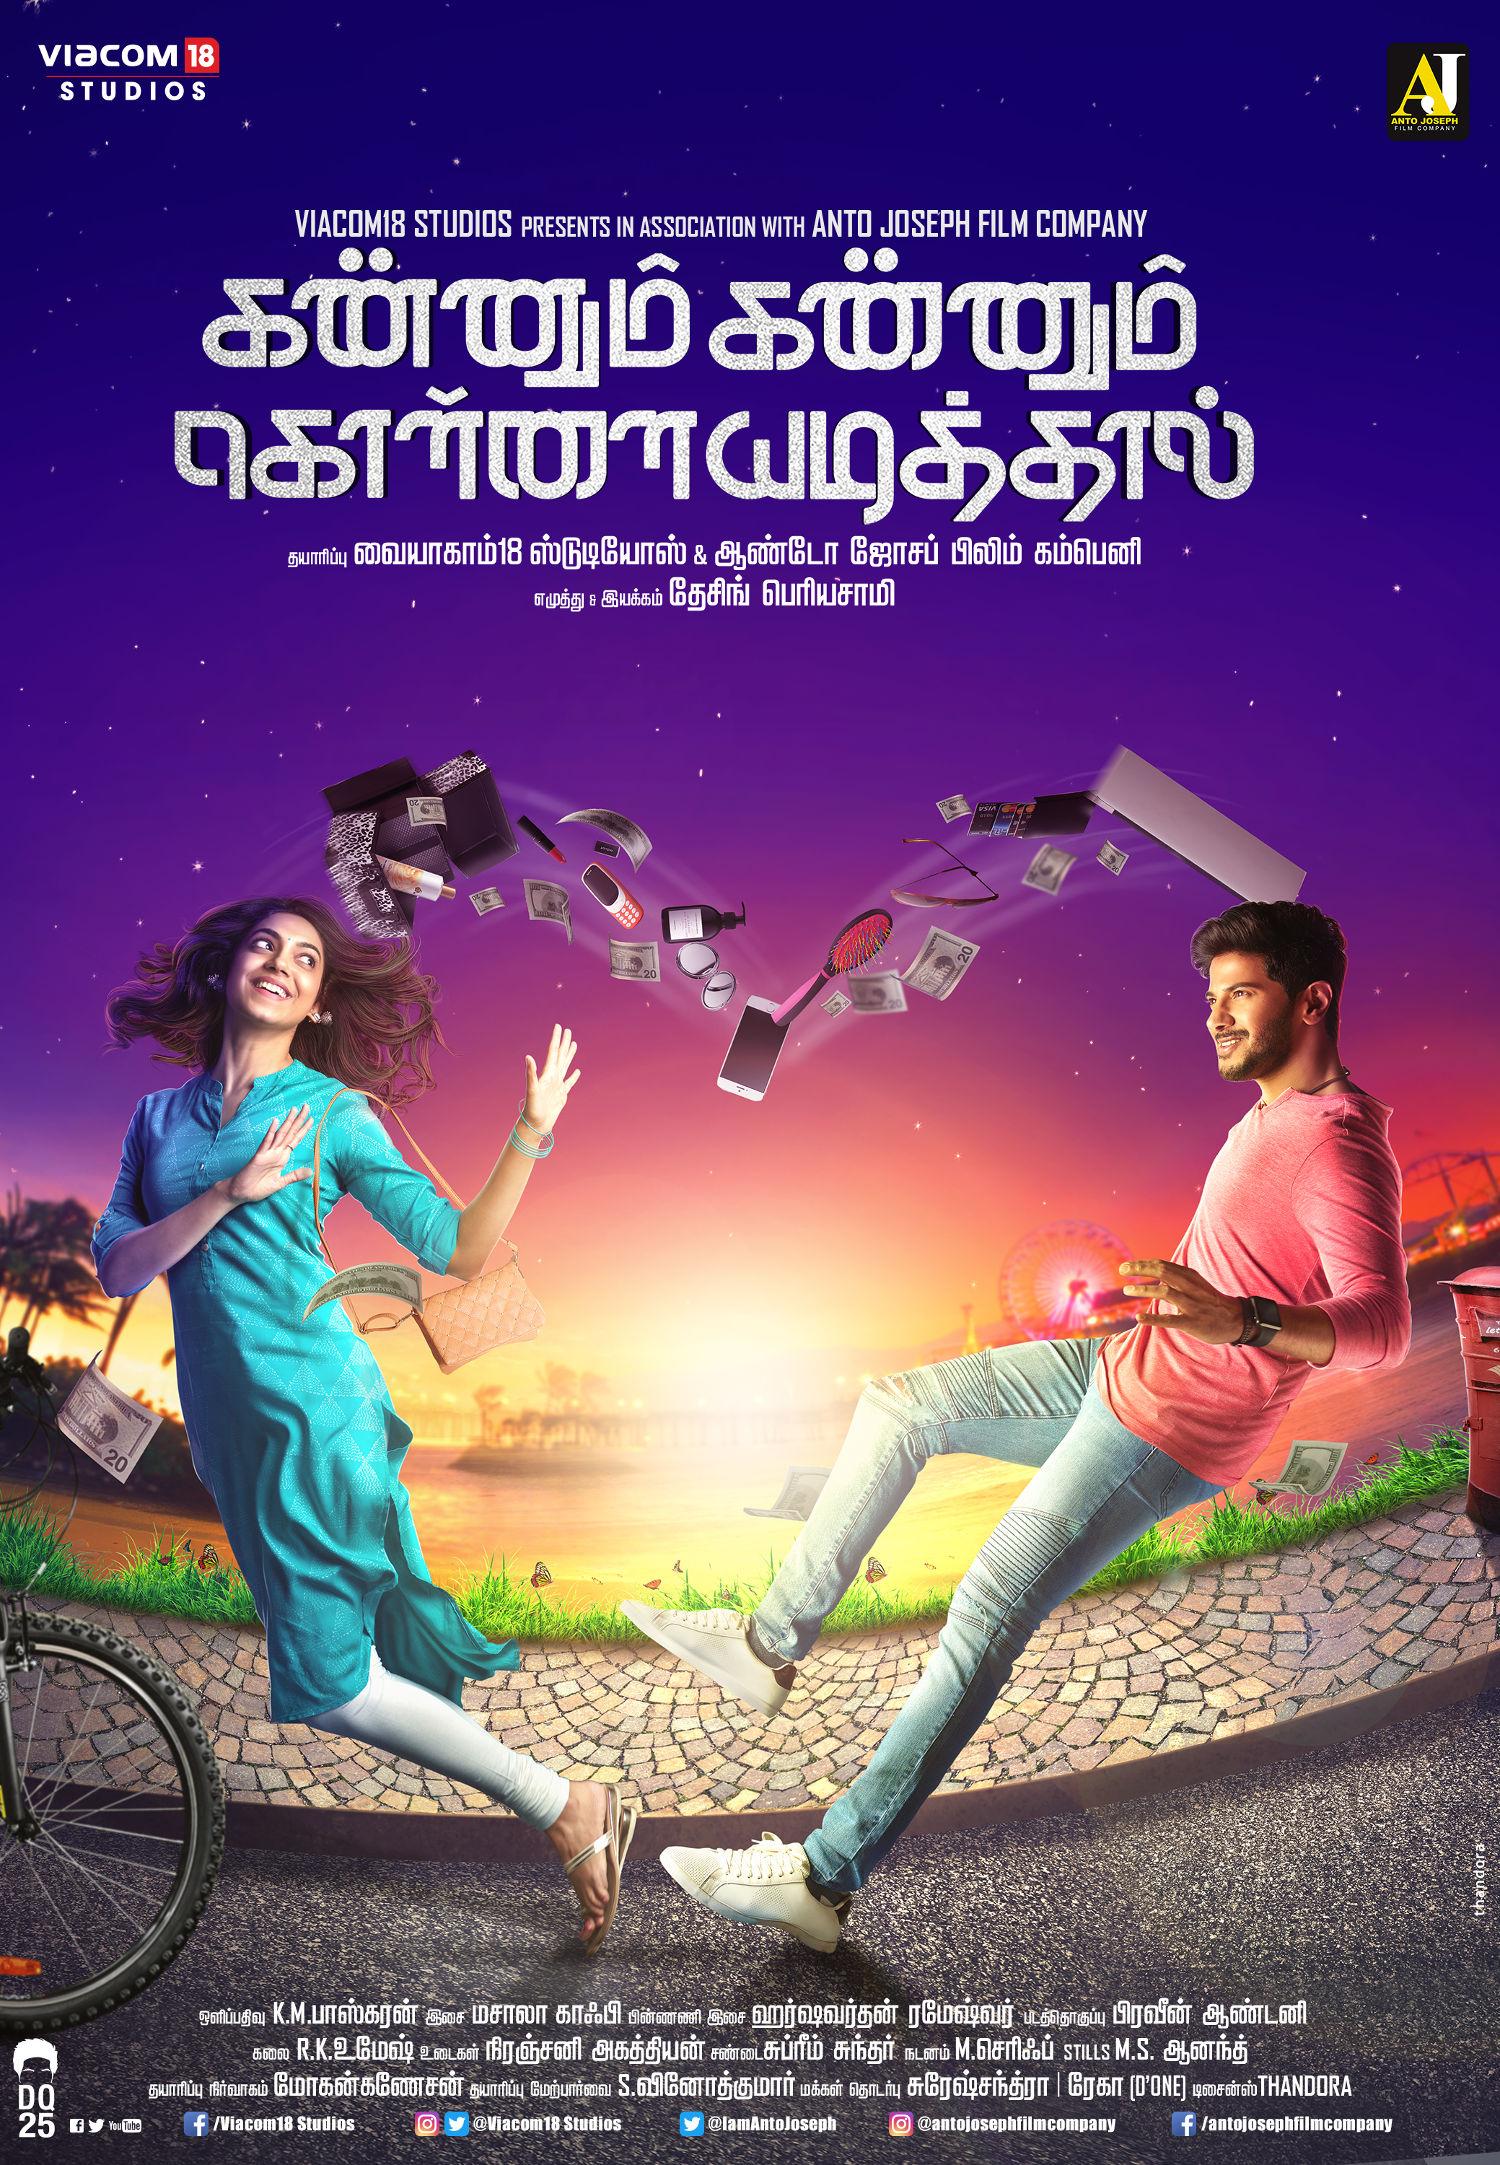 Viacom18 Studios releases Dulquer Salmaan's Kannum Kannum Kollaiyadithaal